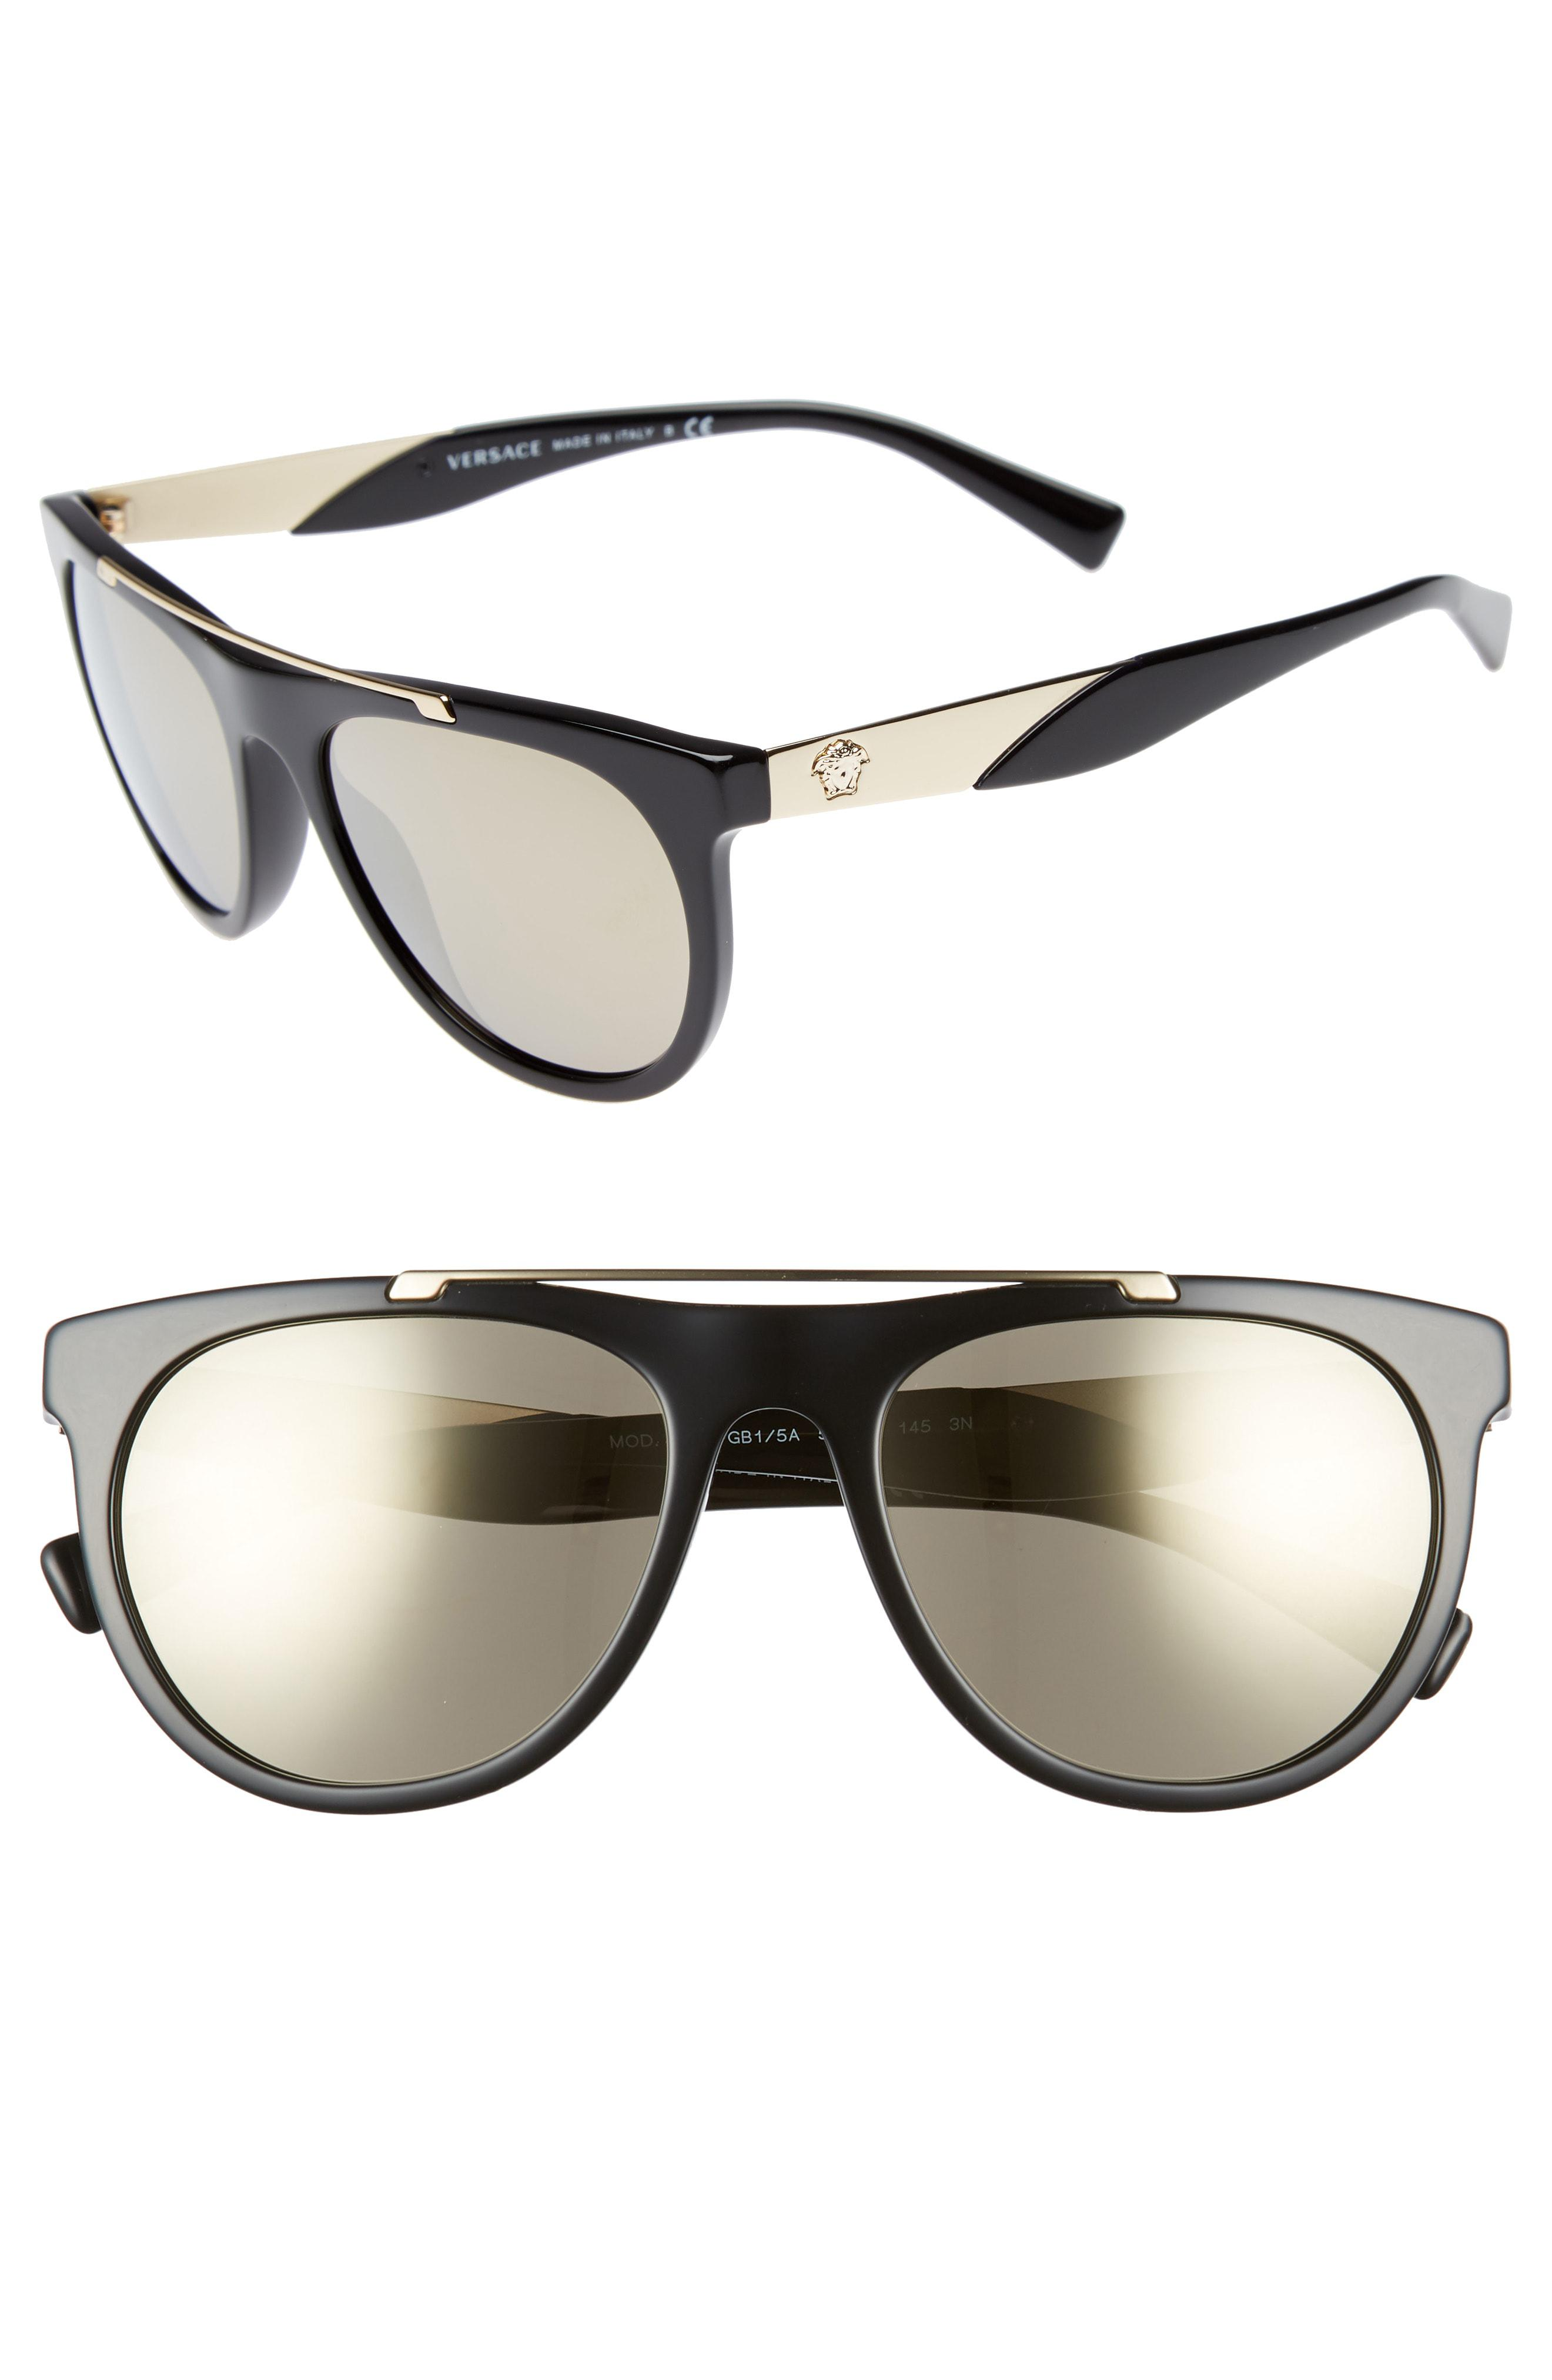 c1093dd39 Lyst - Versace Medusa 56mm Brow Bar Sunglasses - in Gray